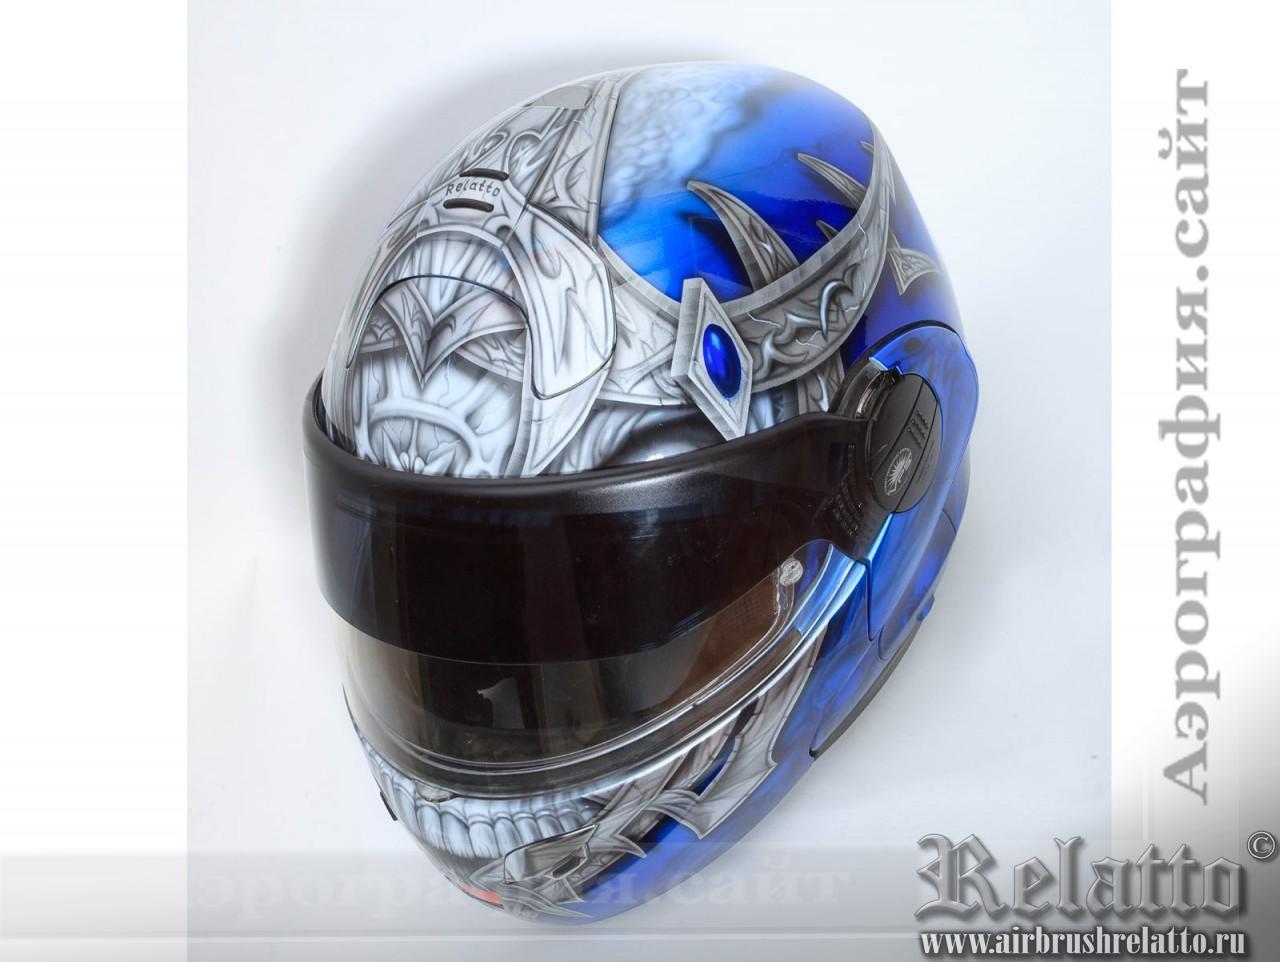 Аэрография шлема - Relatto